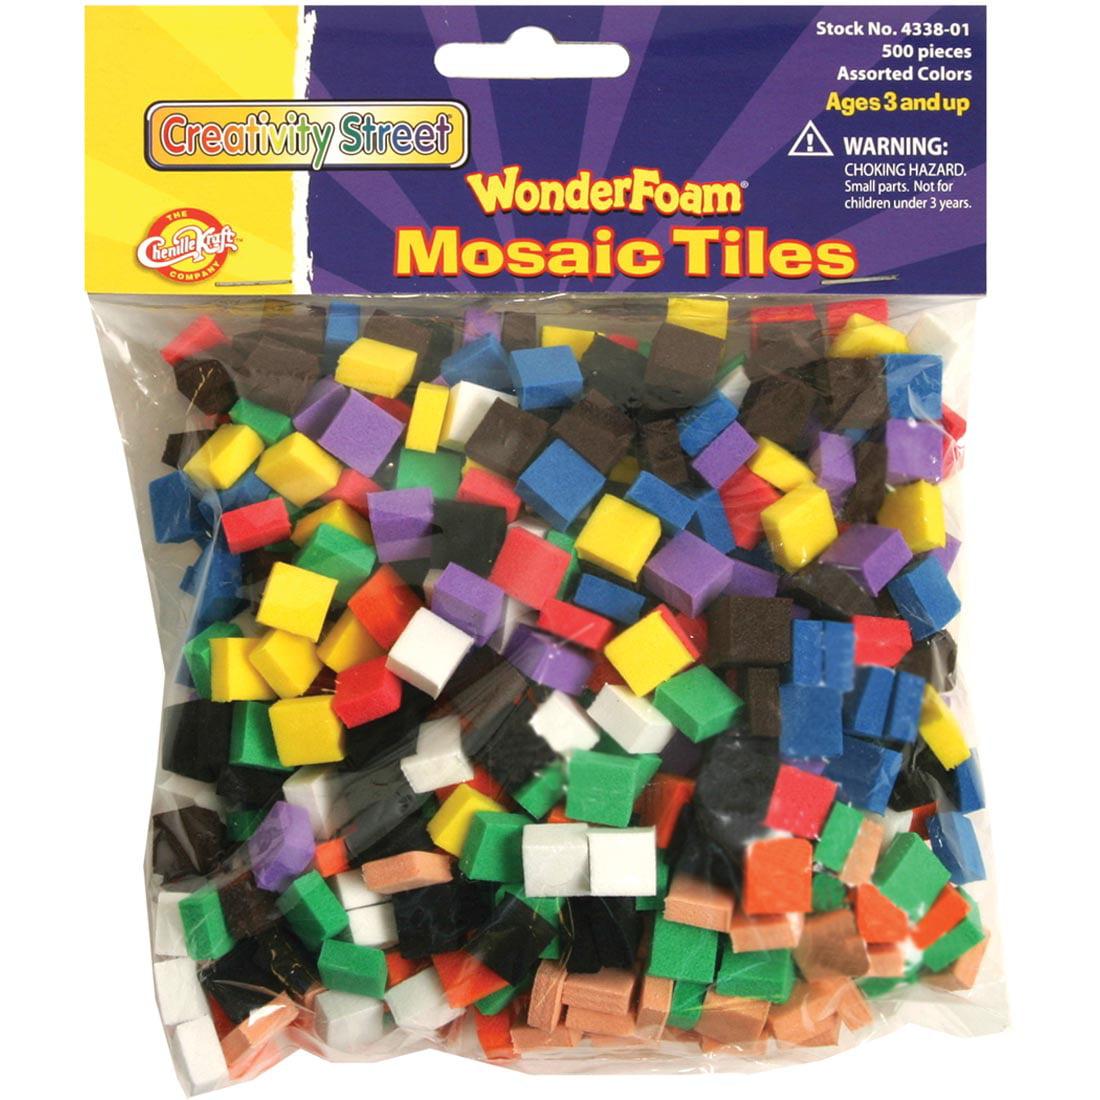 Creativity Street WonderFoam Mosaic Tiles